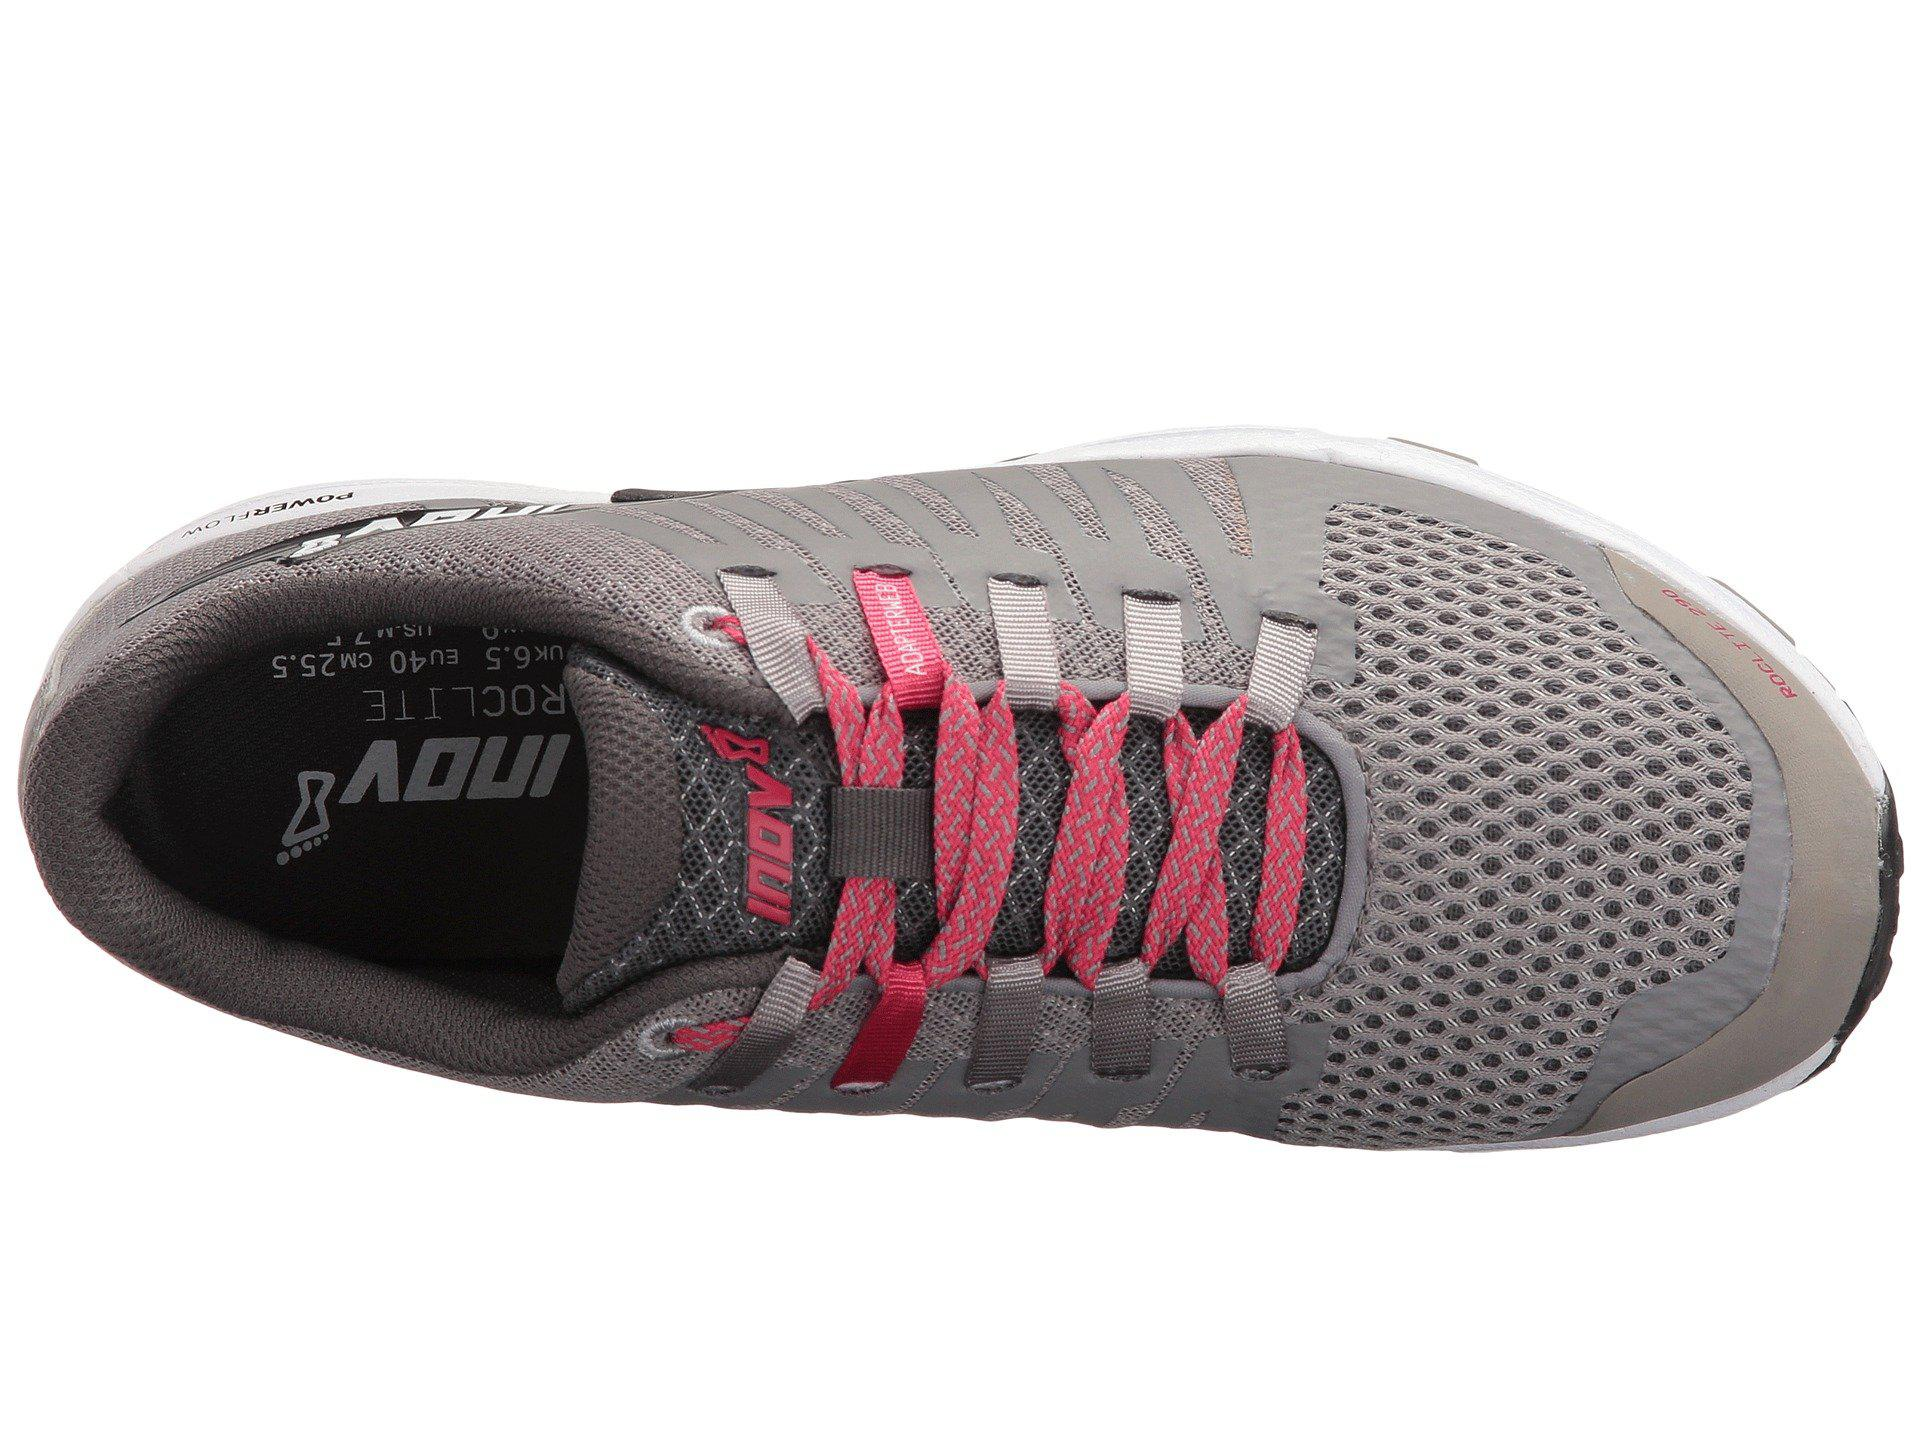 Inov-8 - Gray Roclite 290 (blue Grey white) Women s Shoes -. View fullscreen 096e2016f81